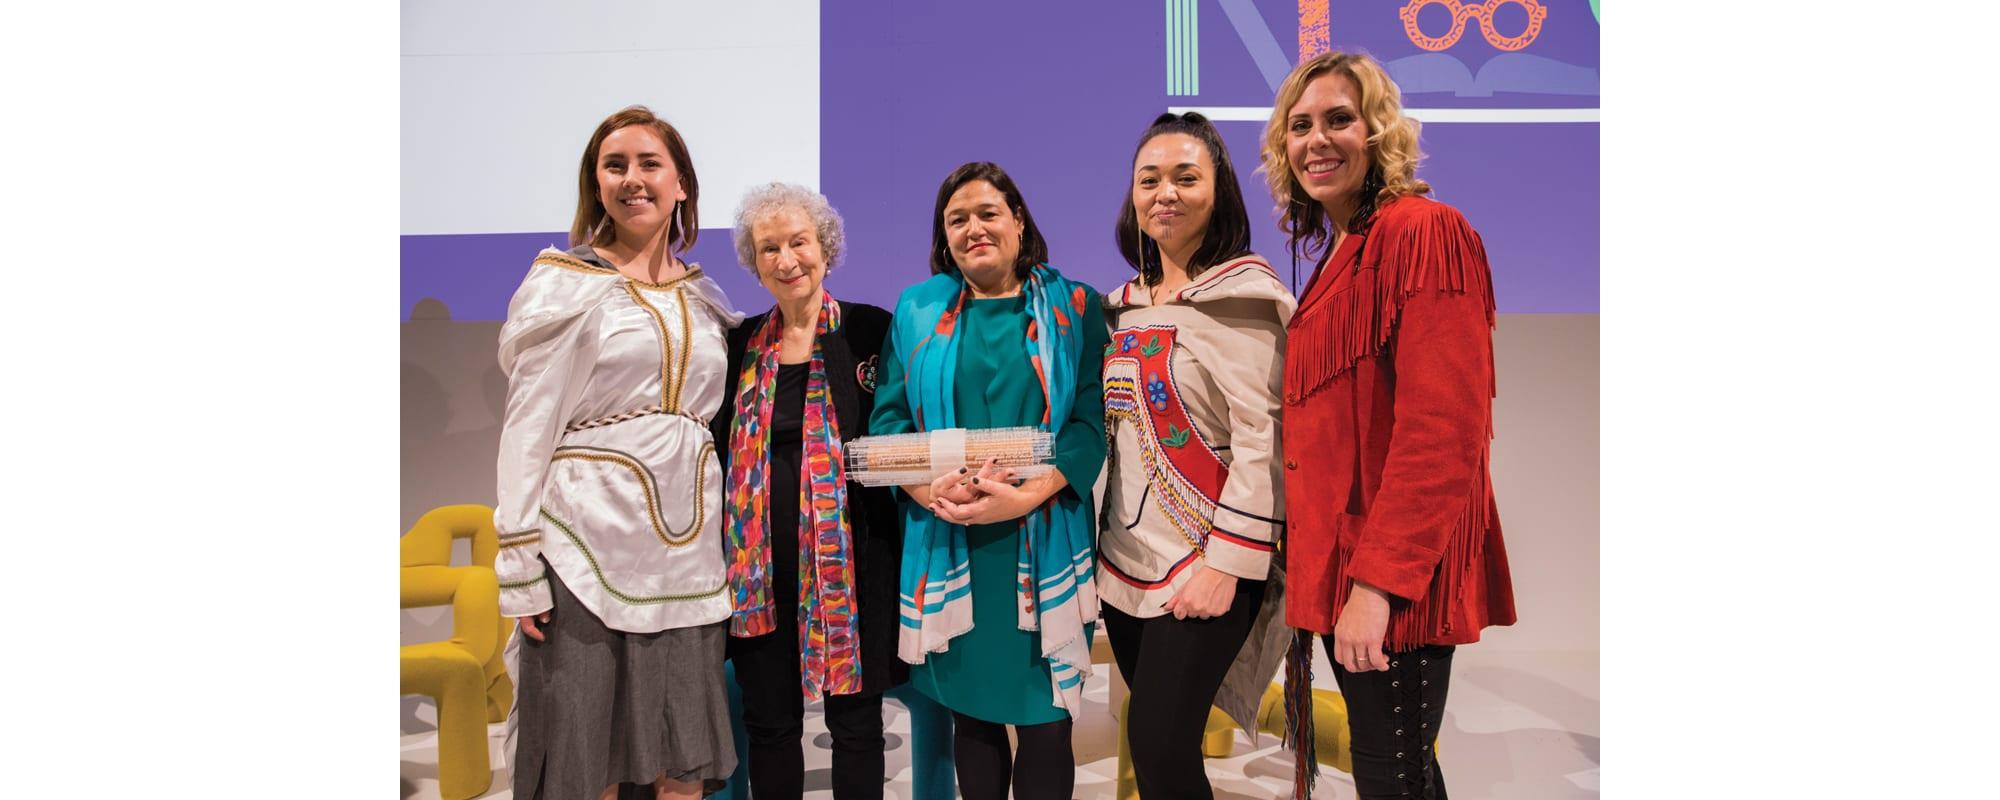 Alexia Galloway-Alainga, Margaret Atwood, Caroline Fortin, Charlotte Qamaniq, and Amanda Rheaum at the Frankfurt Book Fair handover ceremony. Fortin is holding a ceremonial scroll.